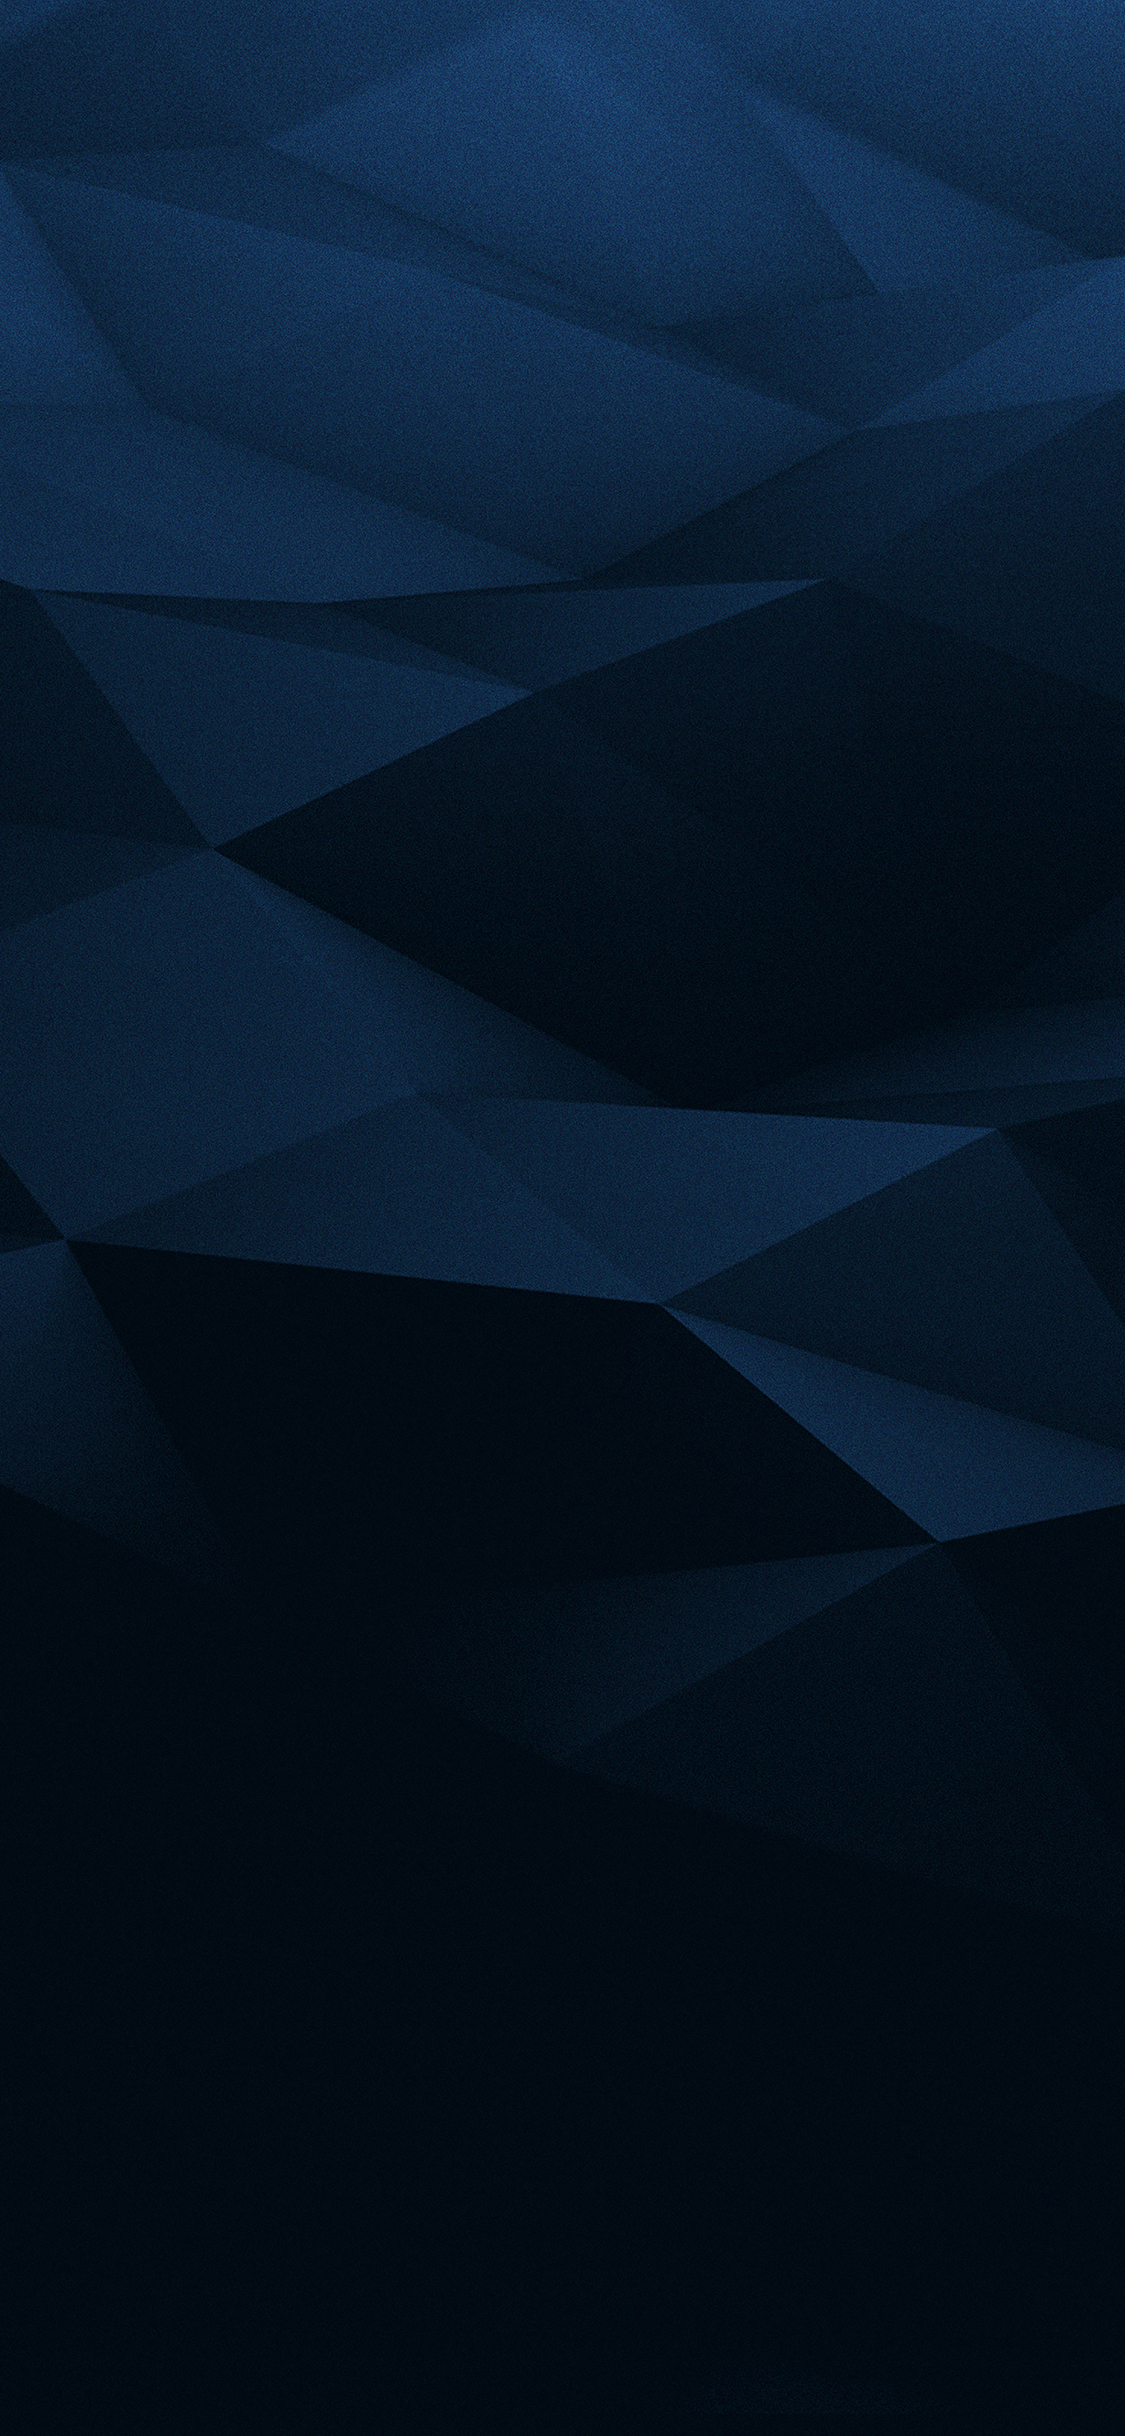 iPhoneXpapers.com-Apple-iPhone-wallpaper-vd78-noir-blue-by-boris-p-borisov-dark-pattern-art